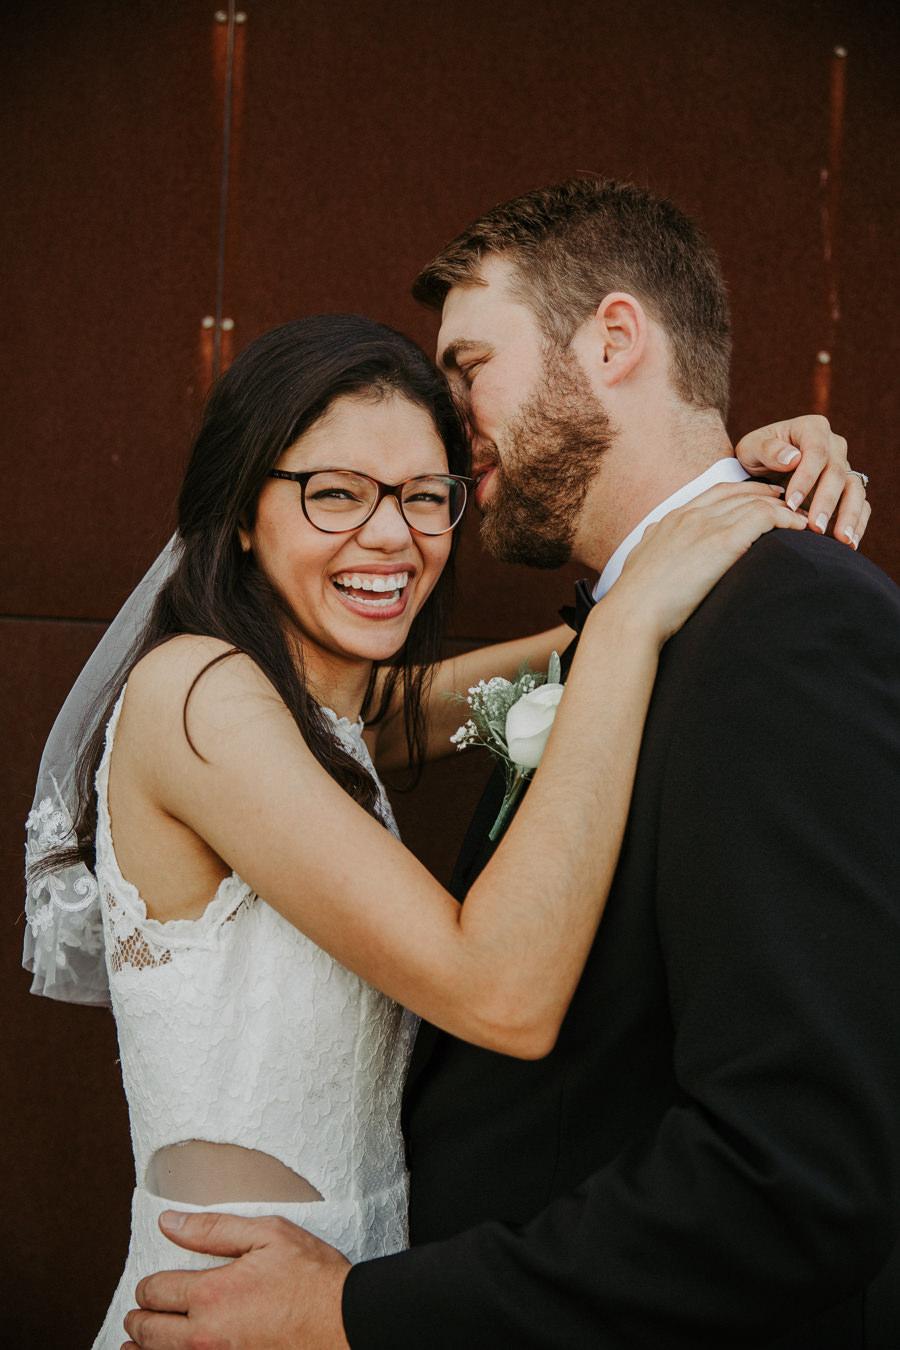 Tampa Heights Industrial Wedding at Cavu Emmy RJ-103.jpg